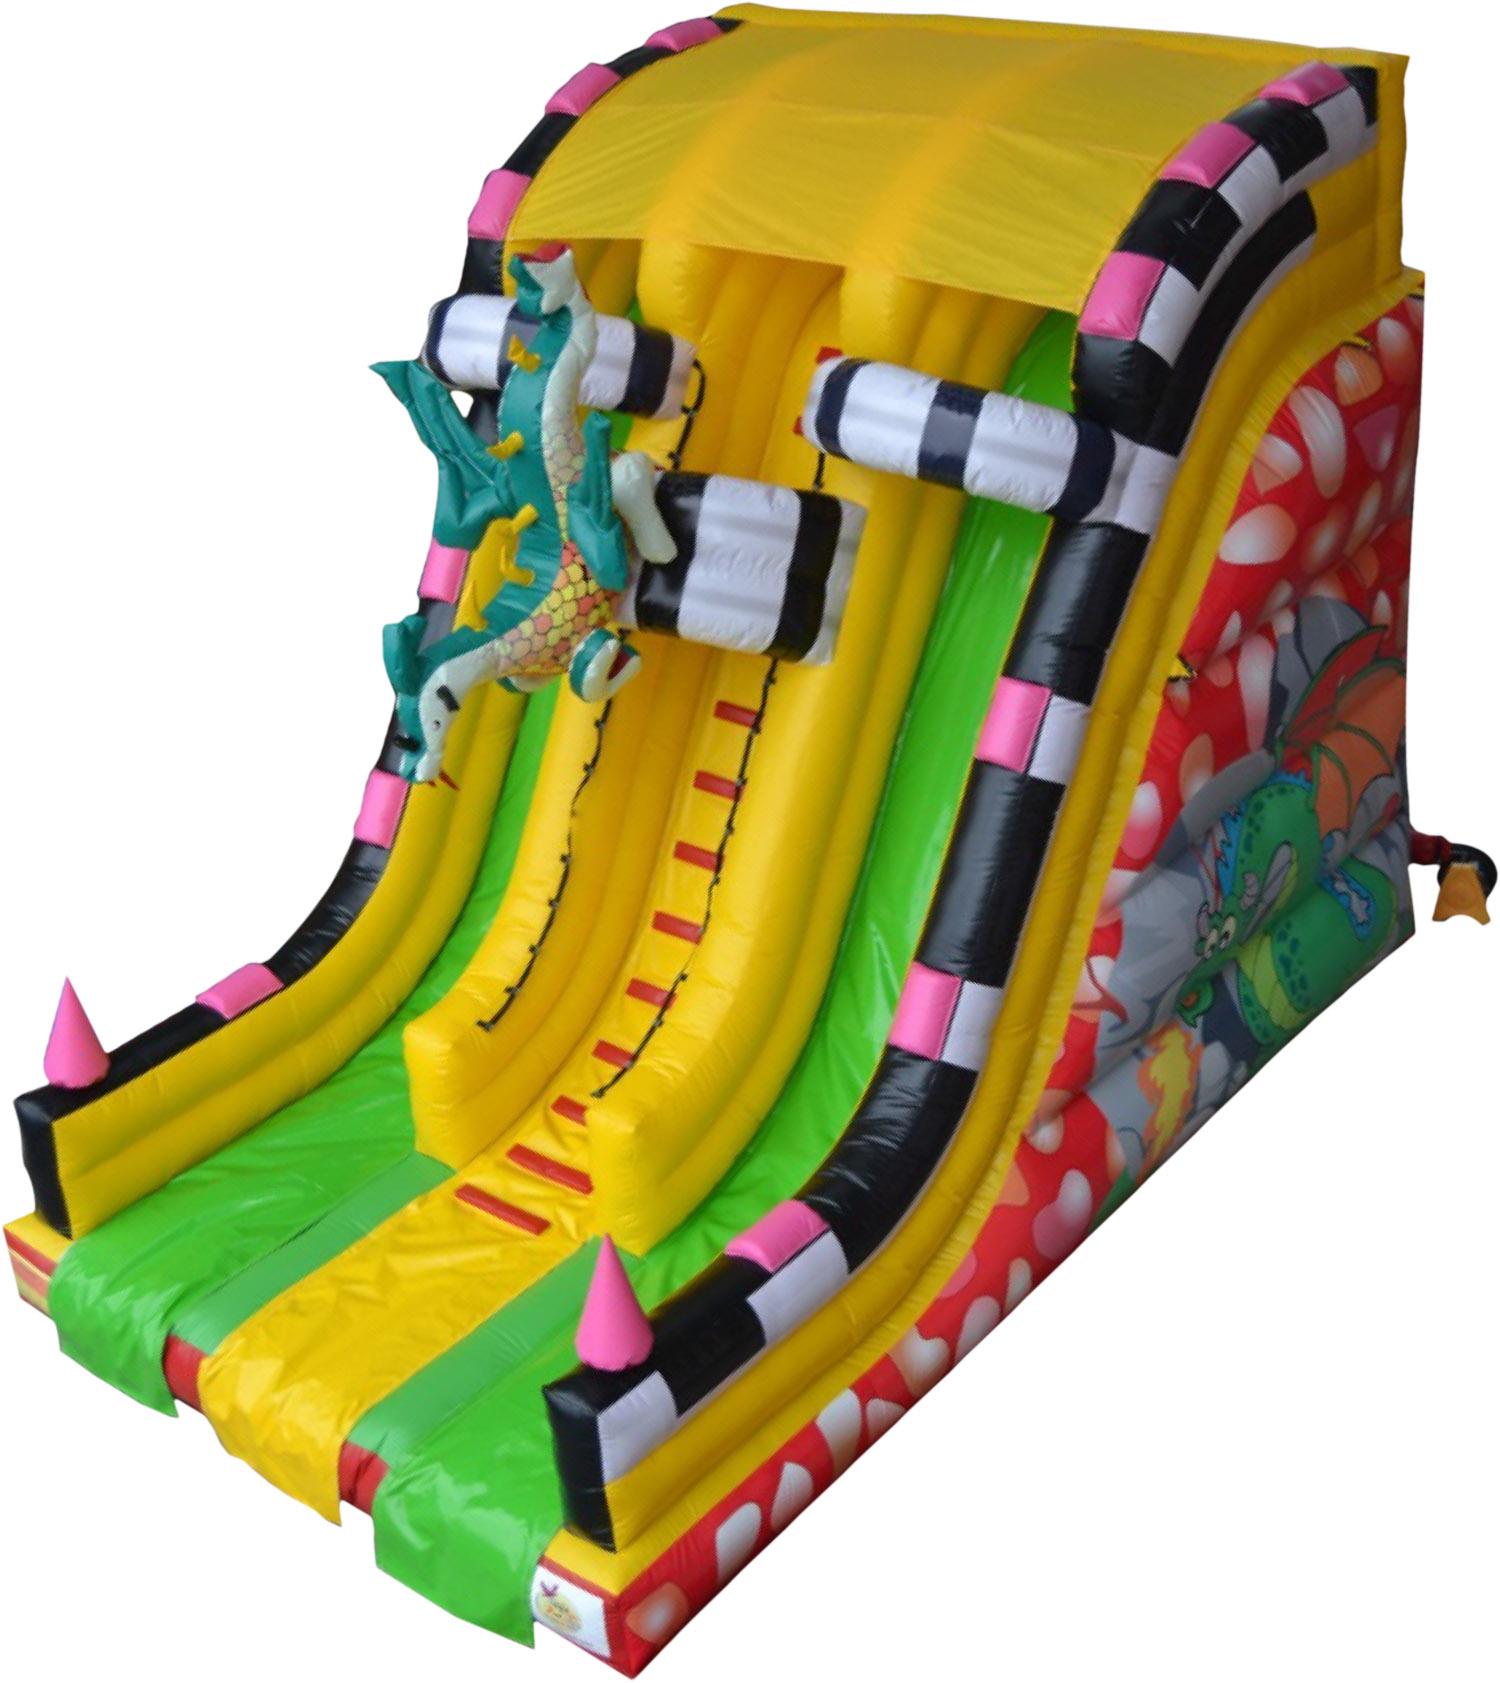 dragon-slide